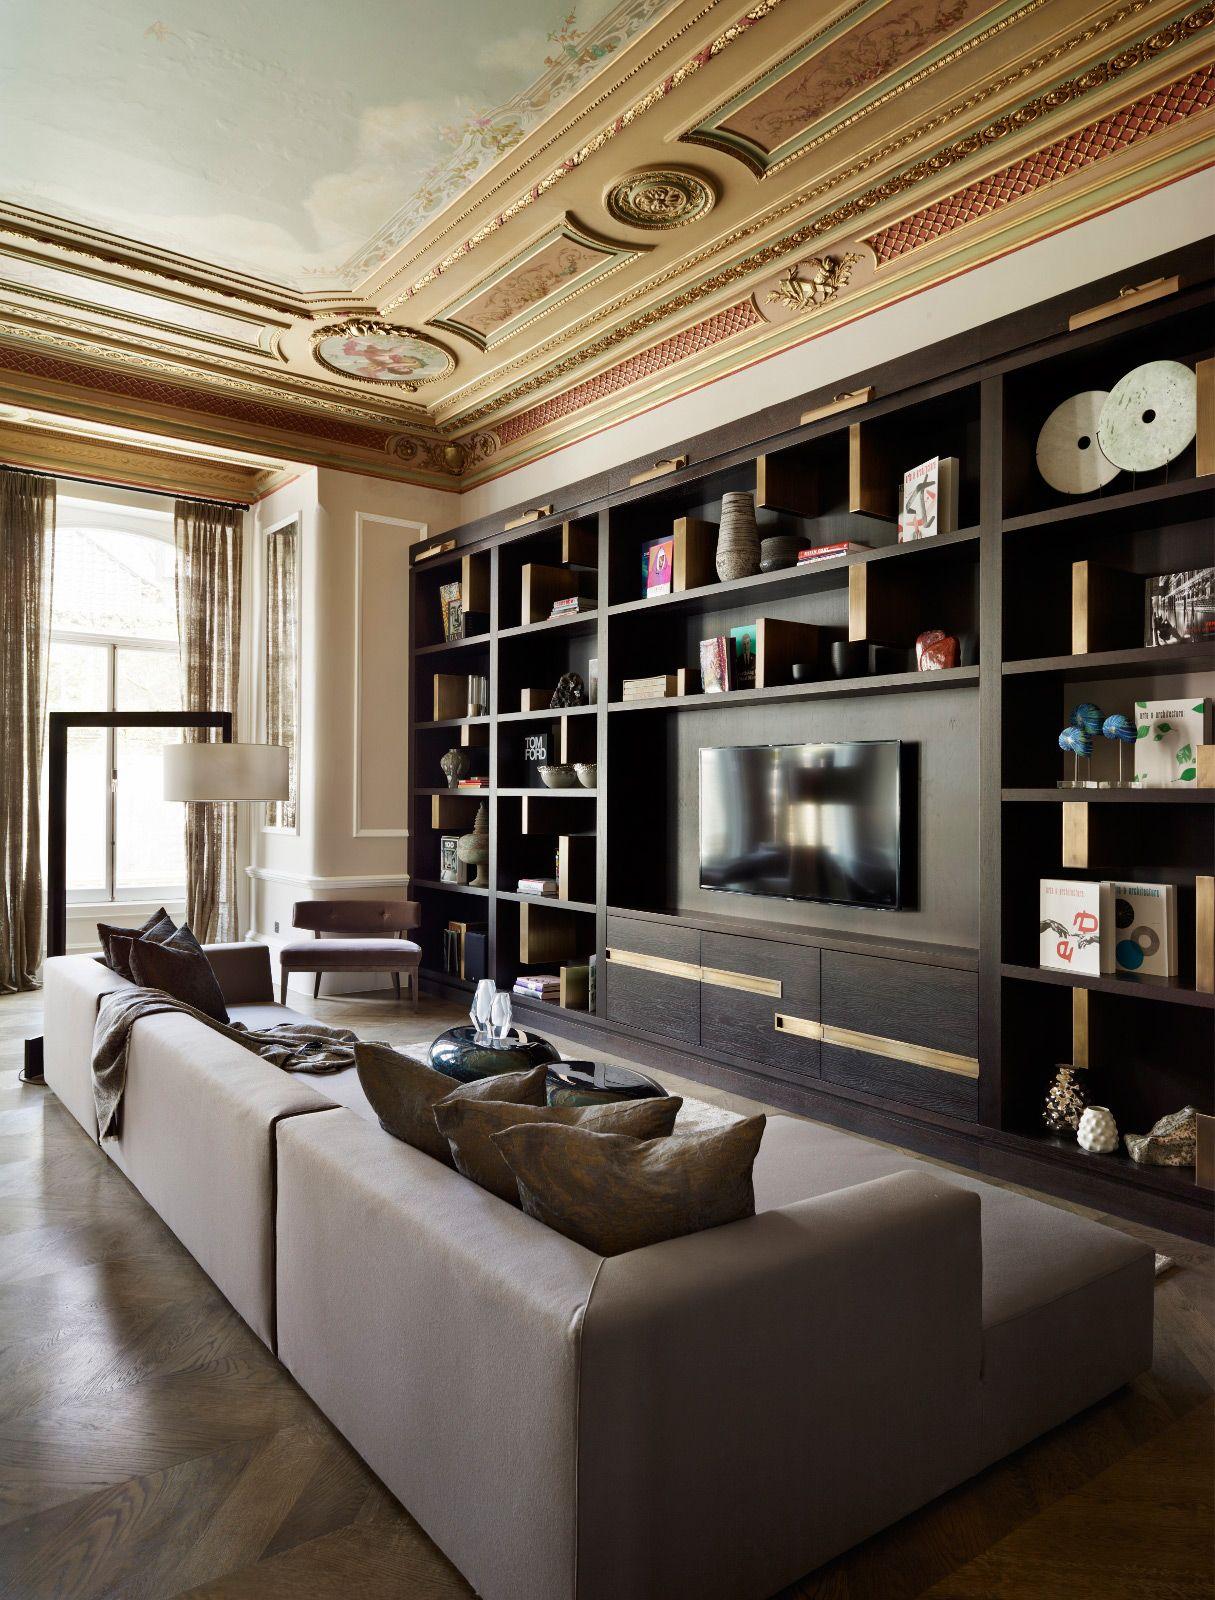 Popular Interior Design For Tv Showcase: London Based Luxury Interior Design. International